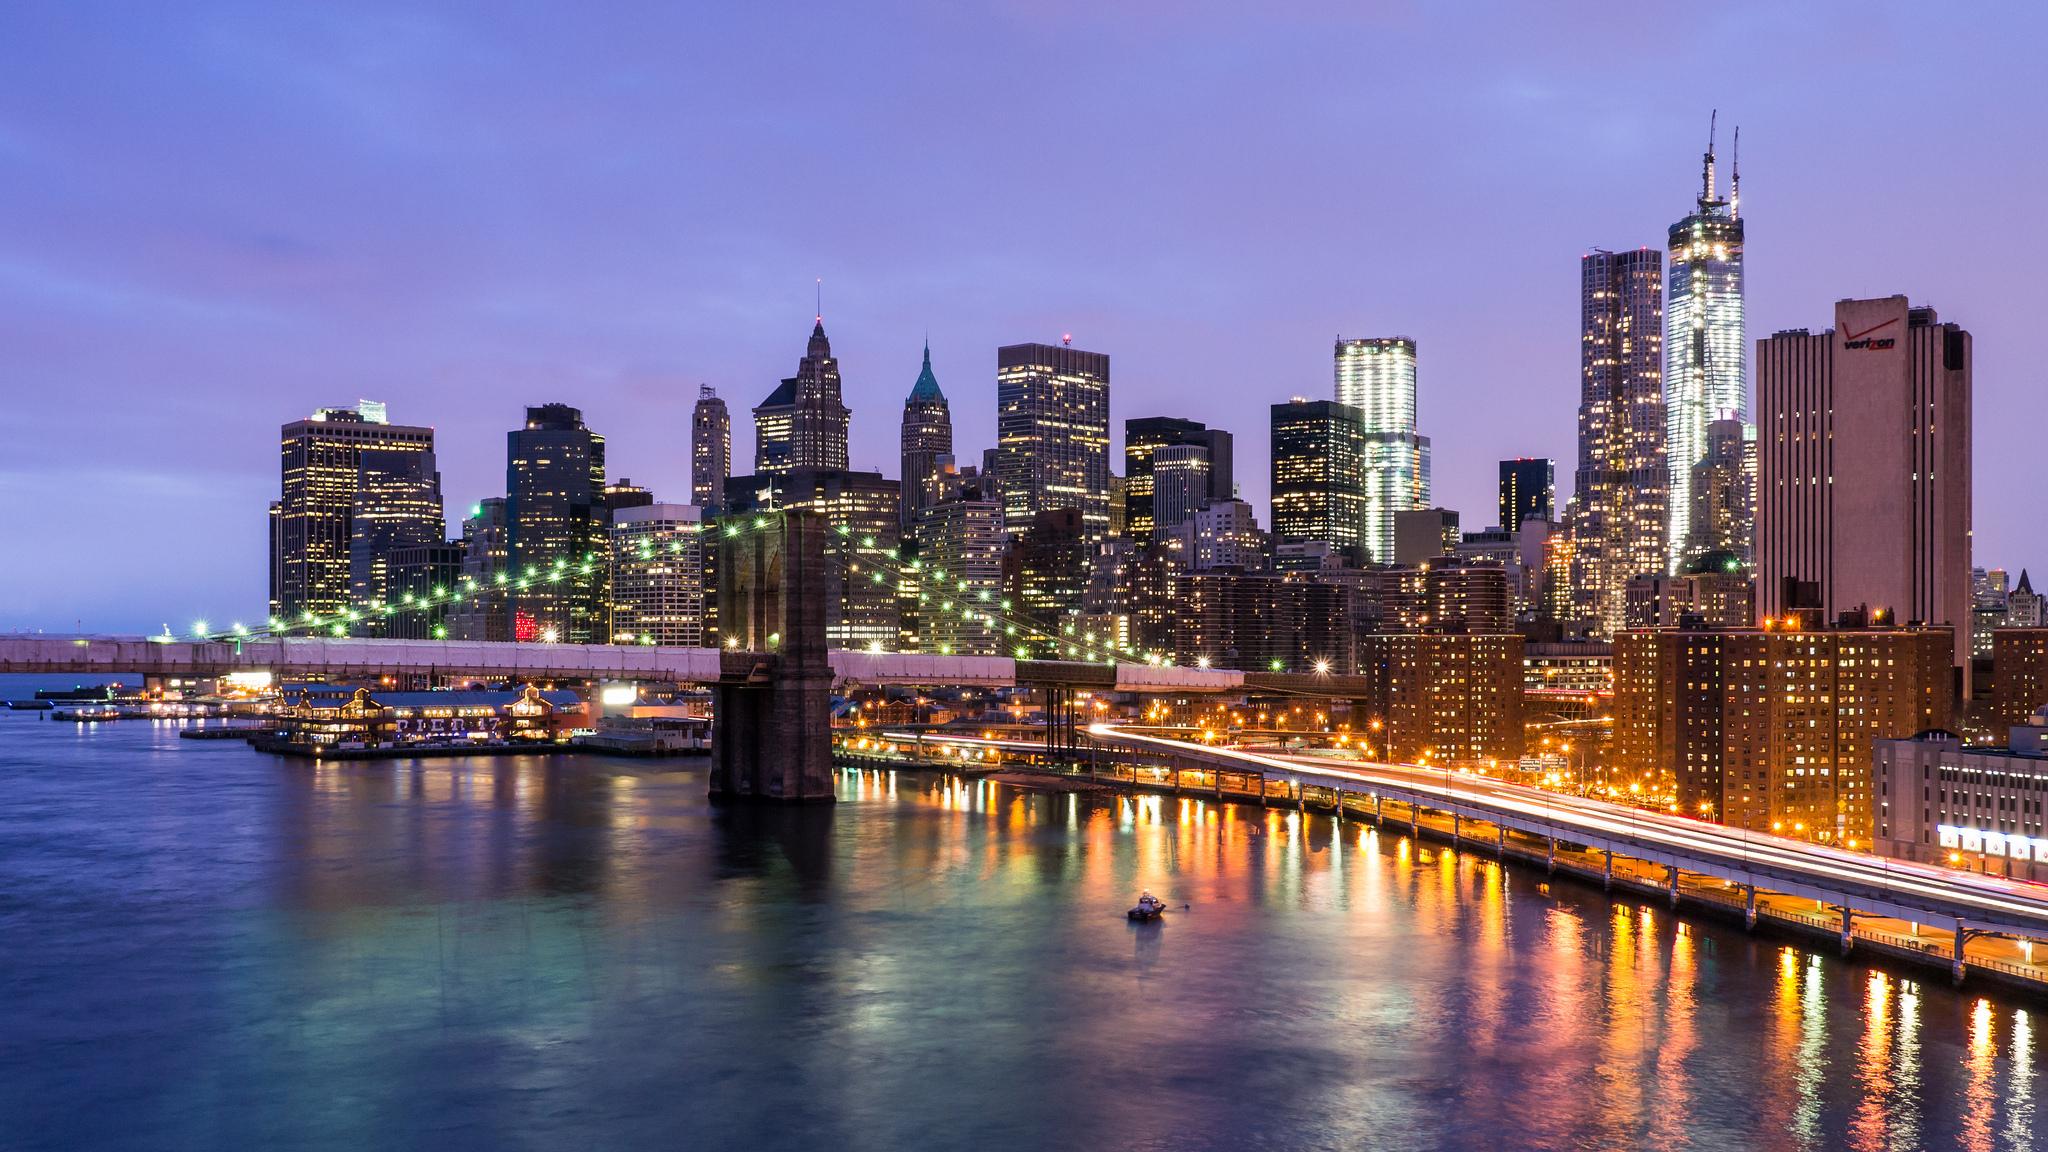 New York City Desktop Wallpaper HD 2048x1152